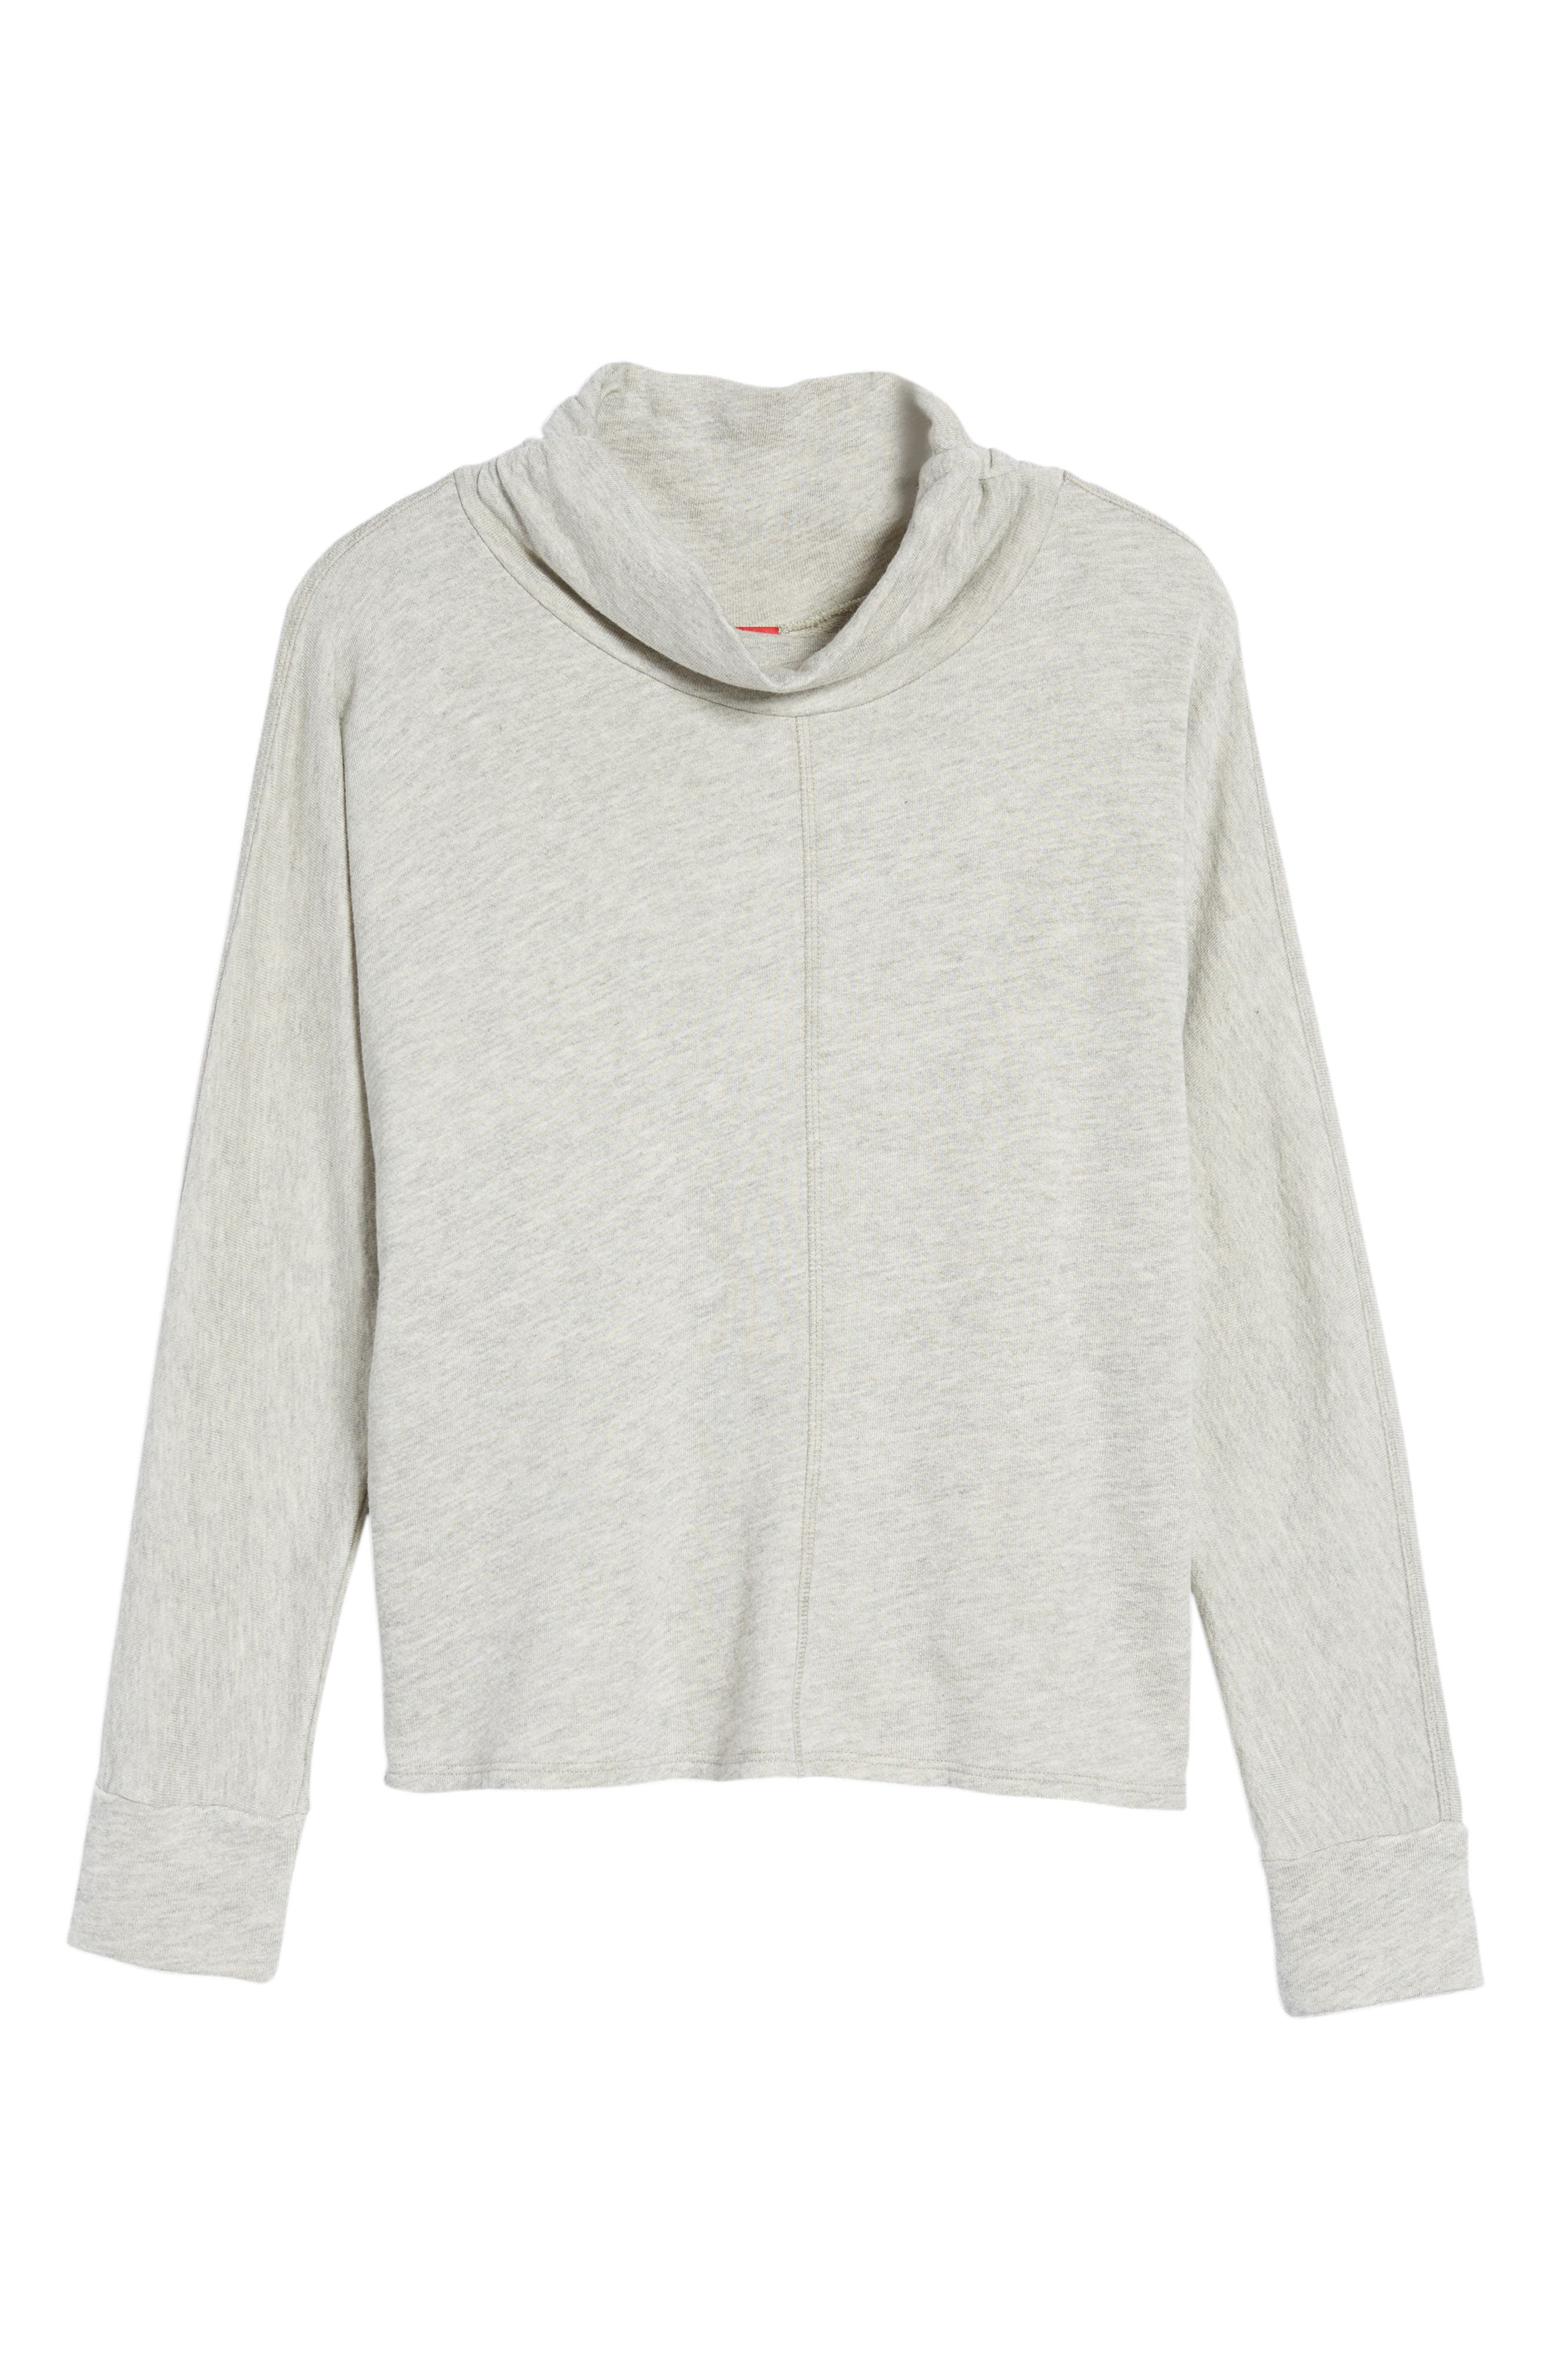 Helix Turtleneck Sweatshirt,                             Alternate thumbnail 6, color,                             030